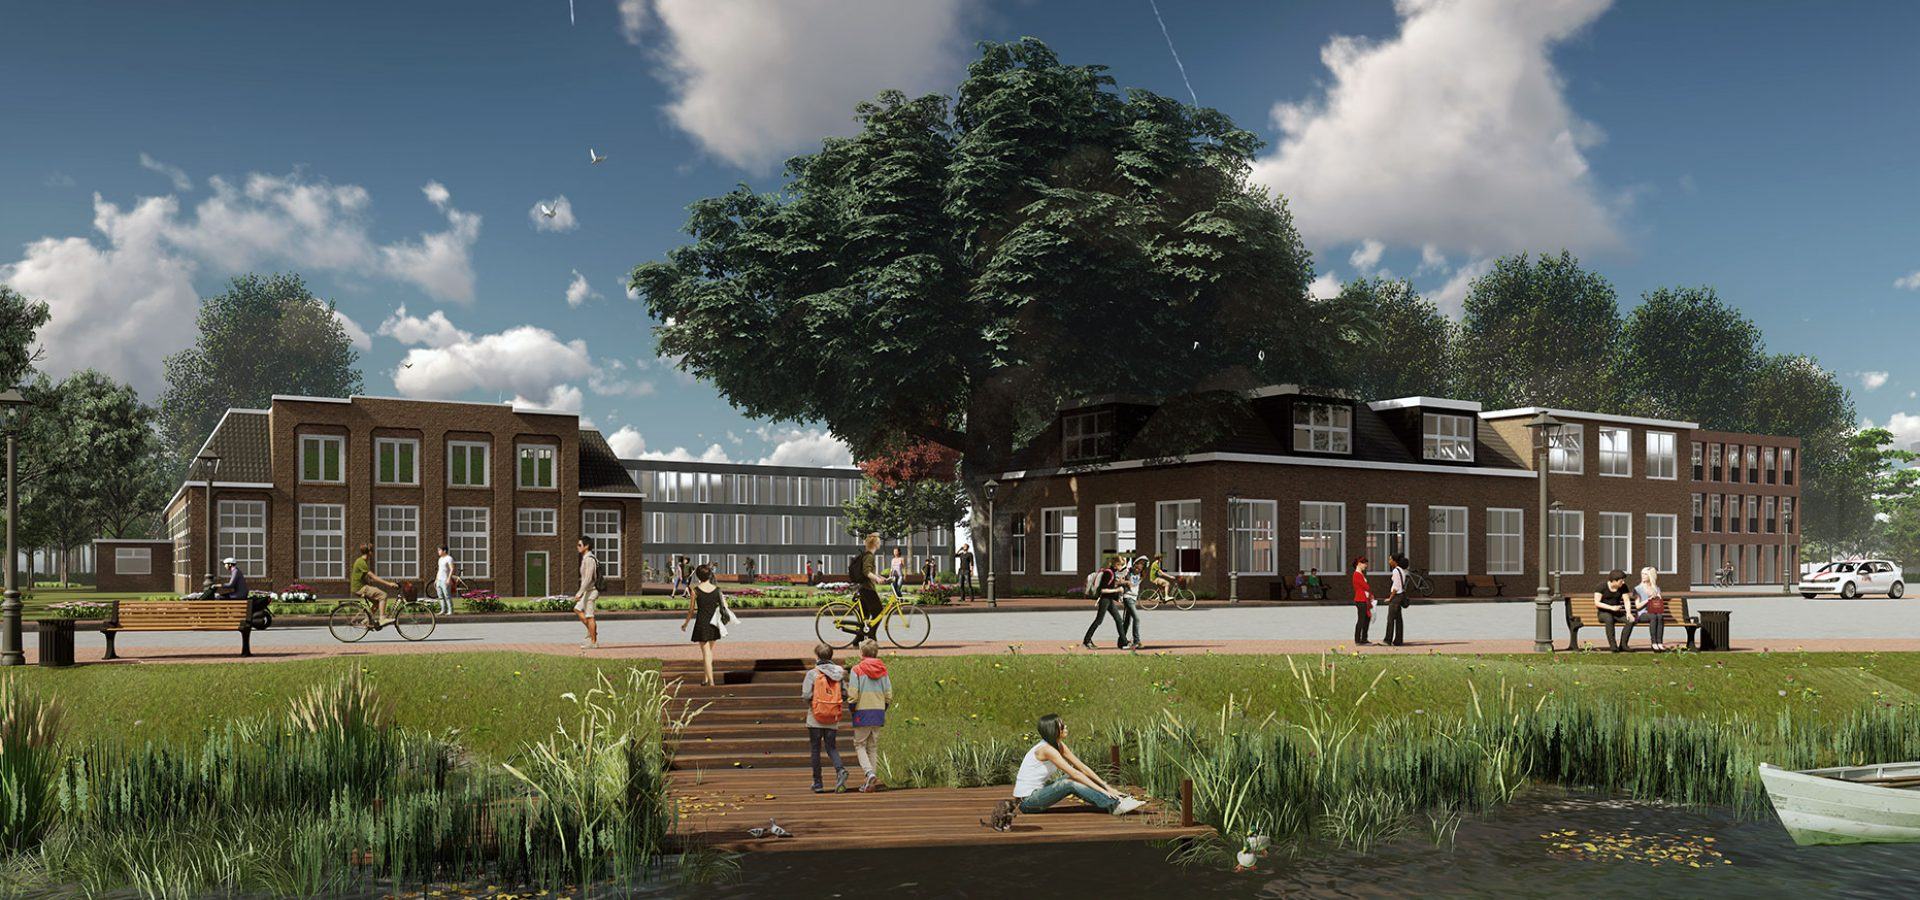 FARO architecten Reggesteyn aan de Regge Nijverdal 03